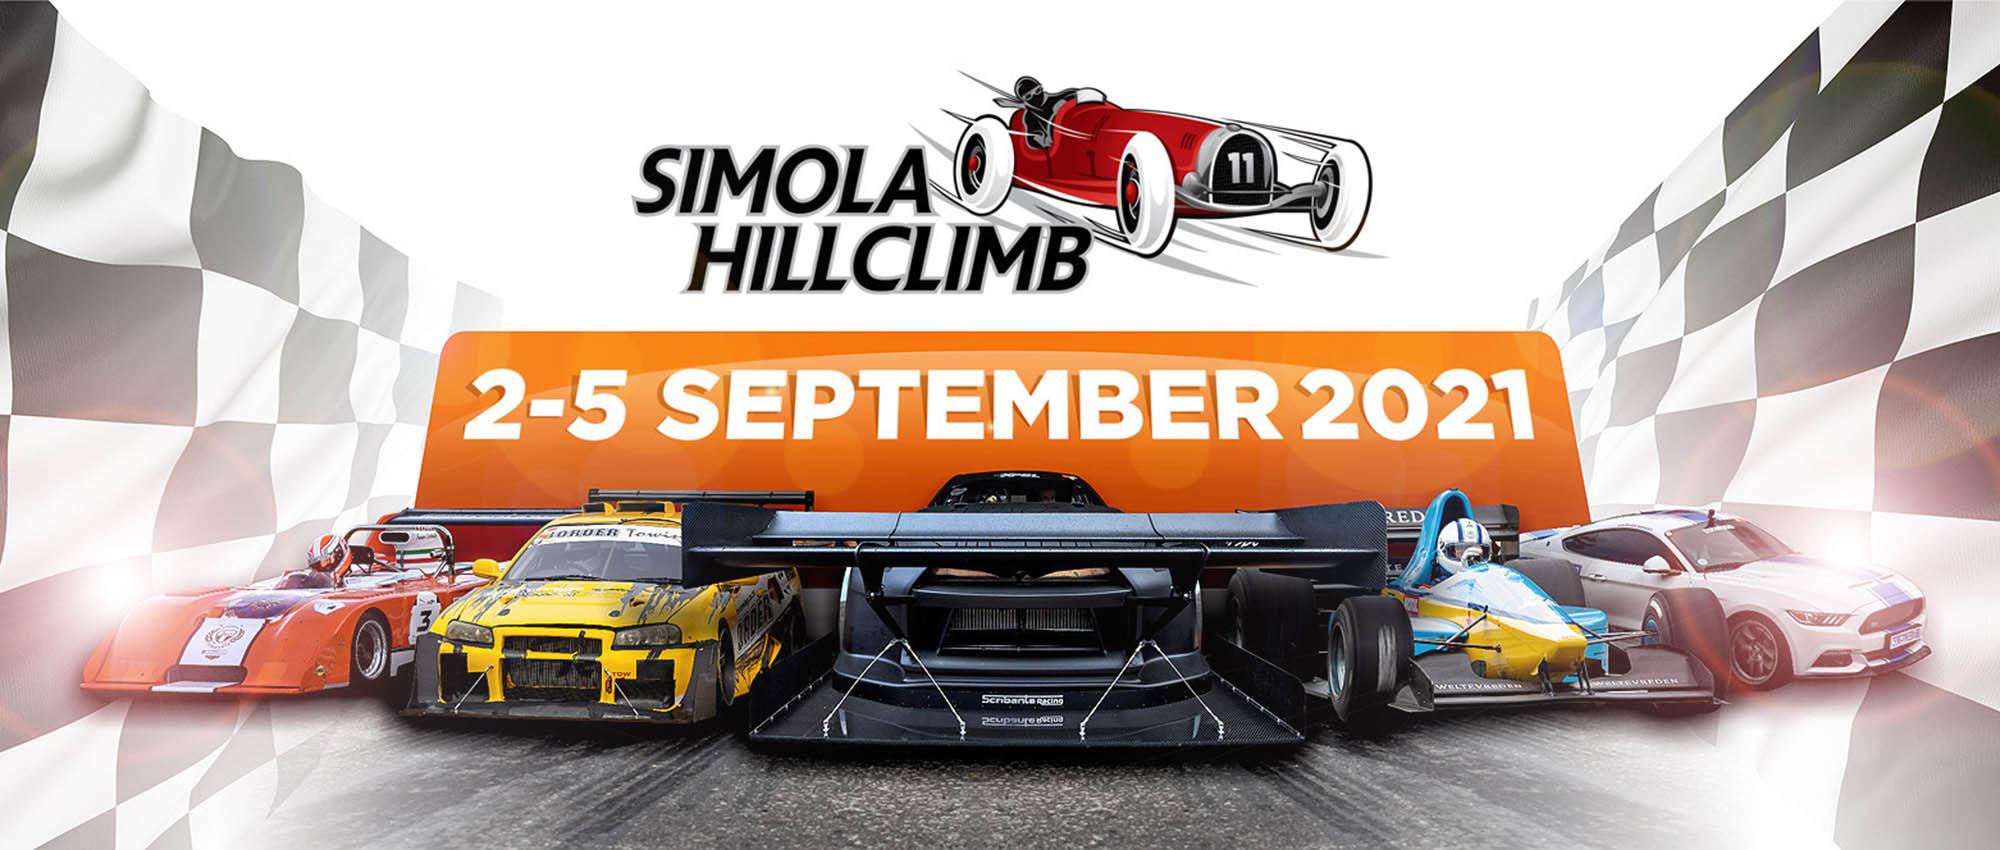 2021 Simola Hillclimb